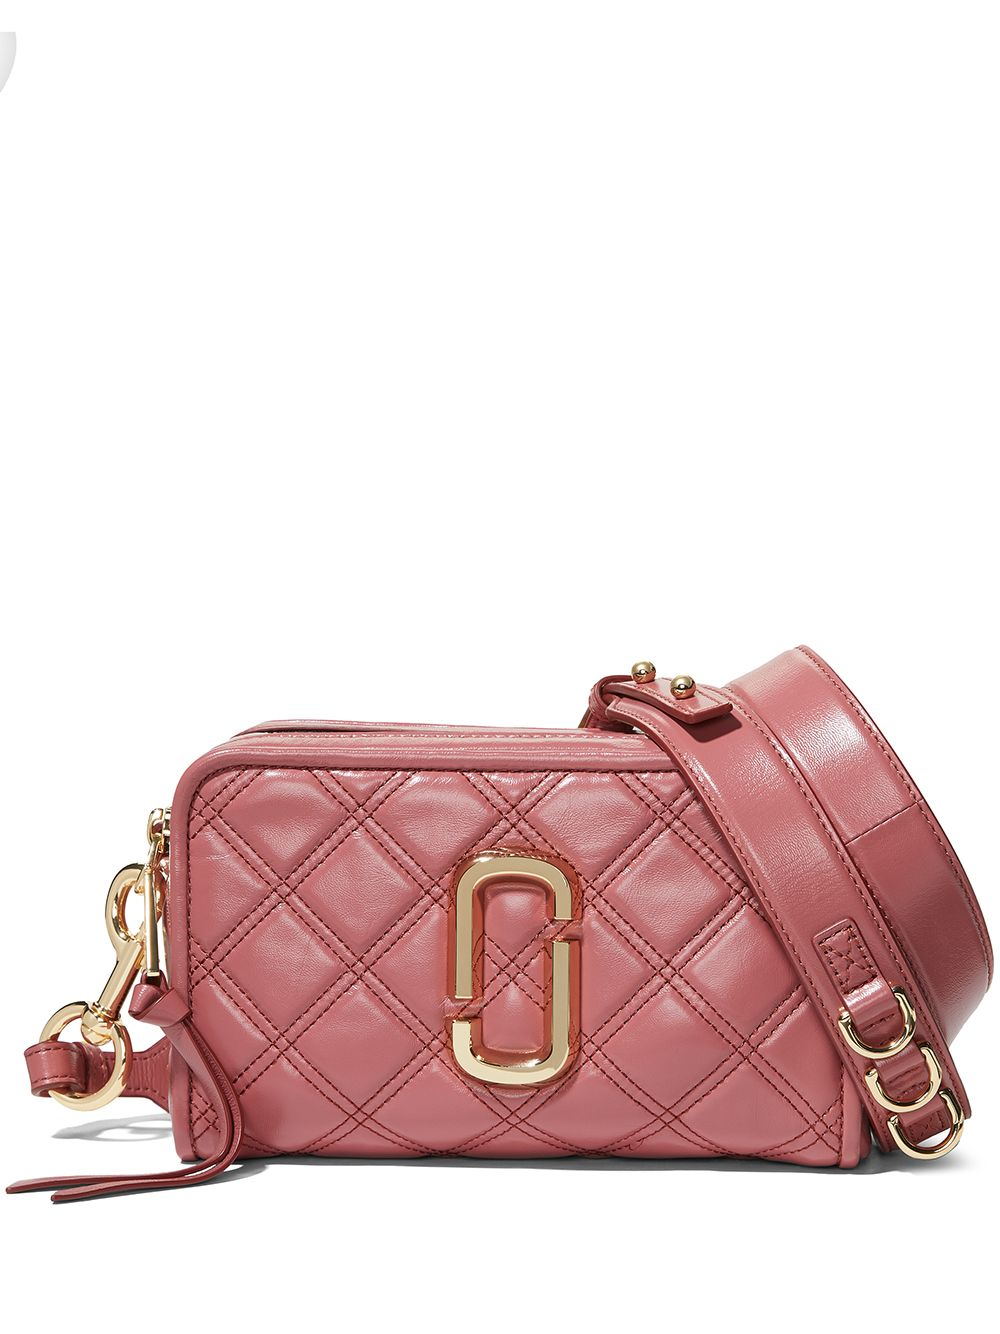 The Softshot 21 Leather Bag